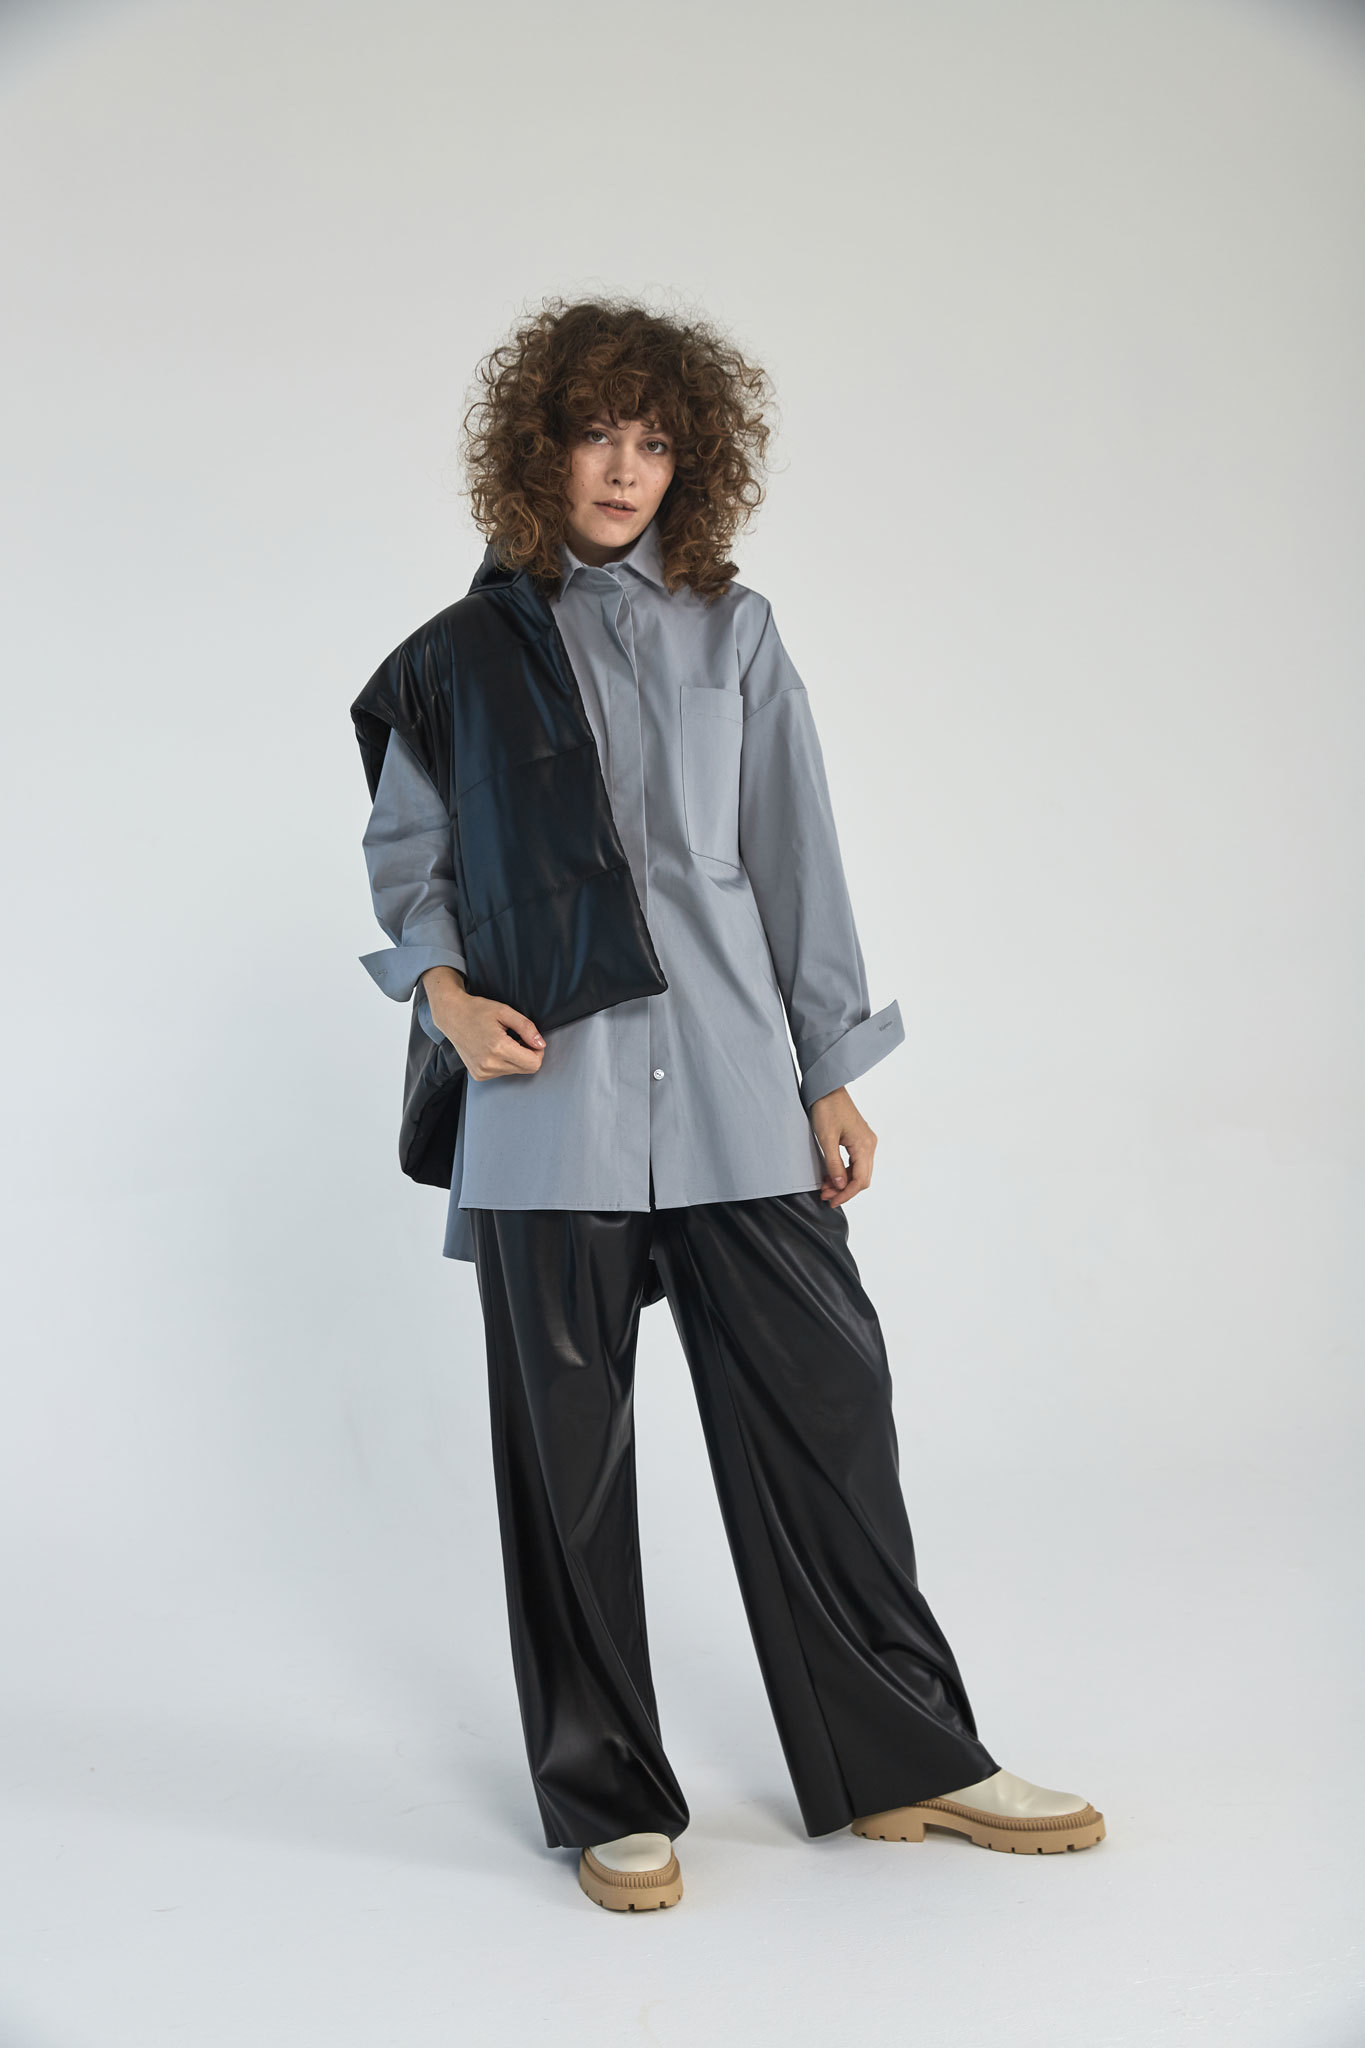 Рубашка оверсайз в мужском стиле, айсберг